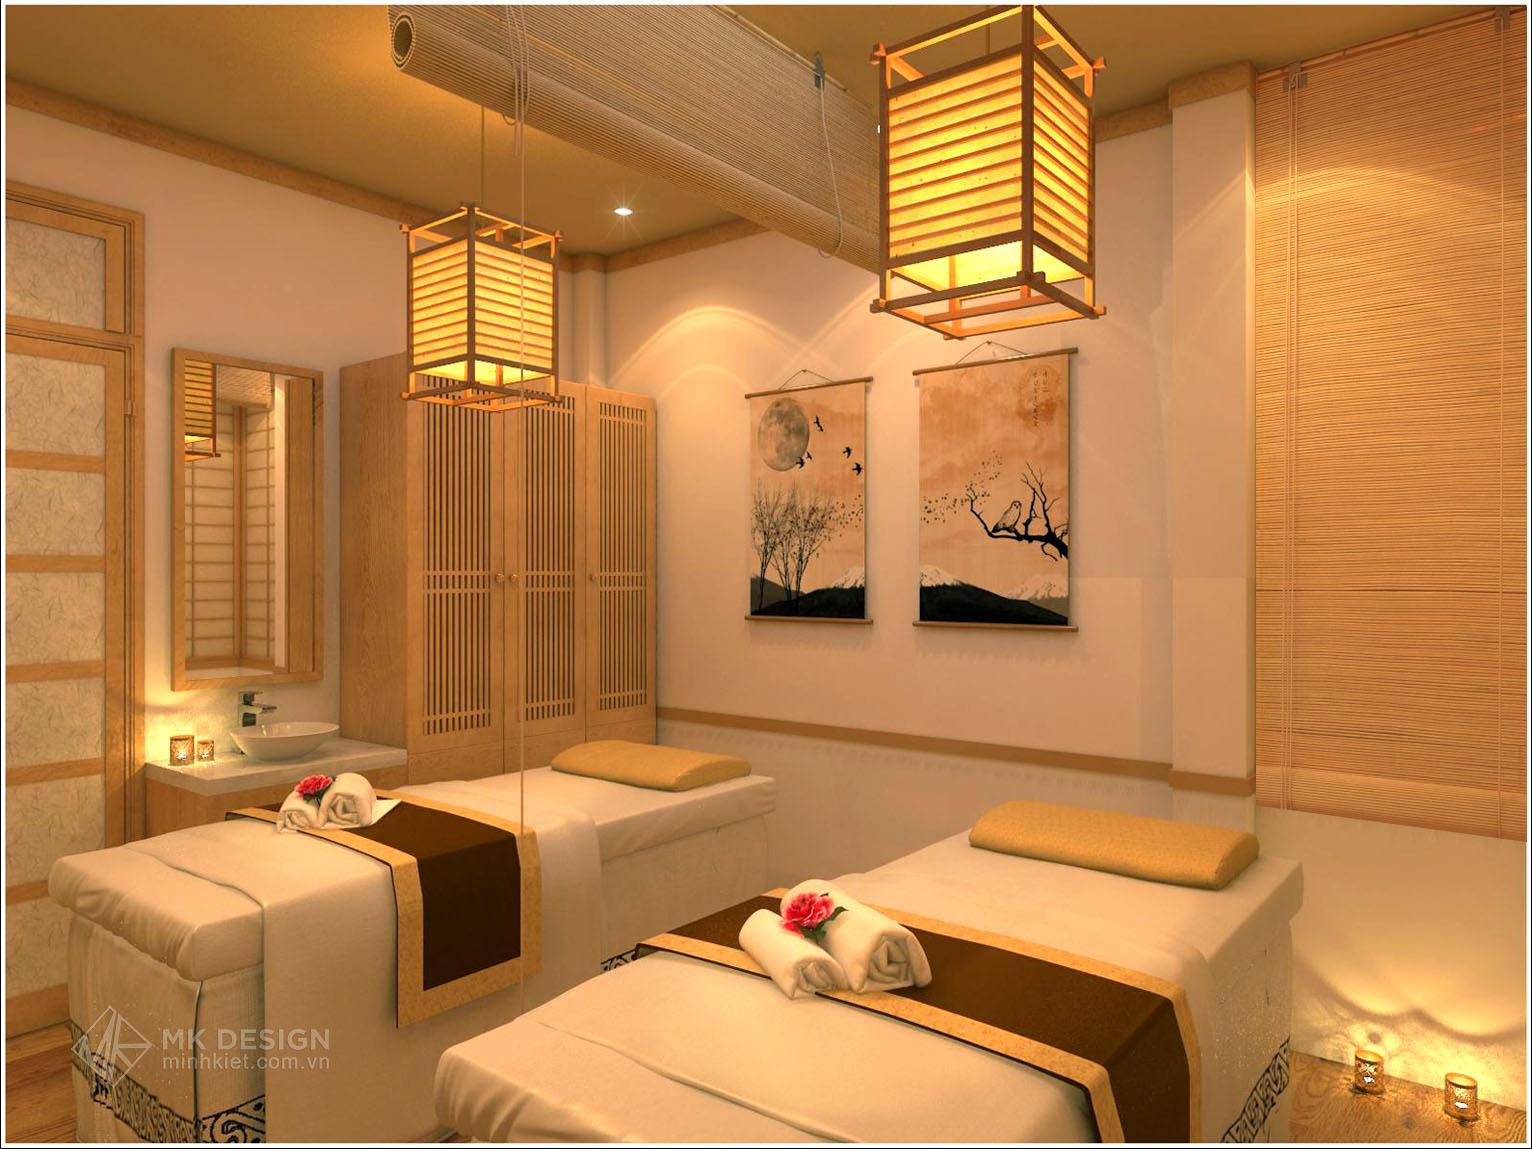 spa-momo-nhat-ban-Minh-Kiet-Design13